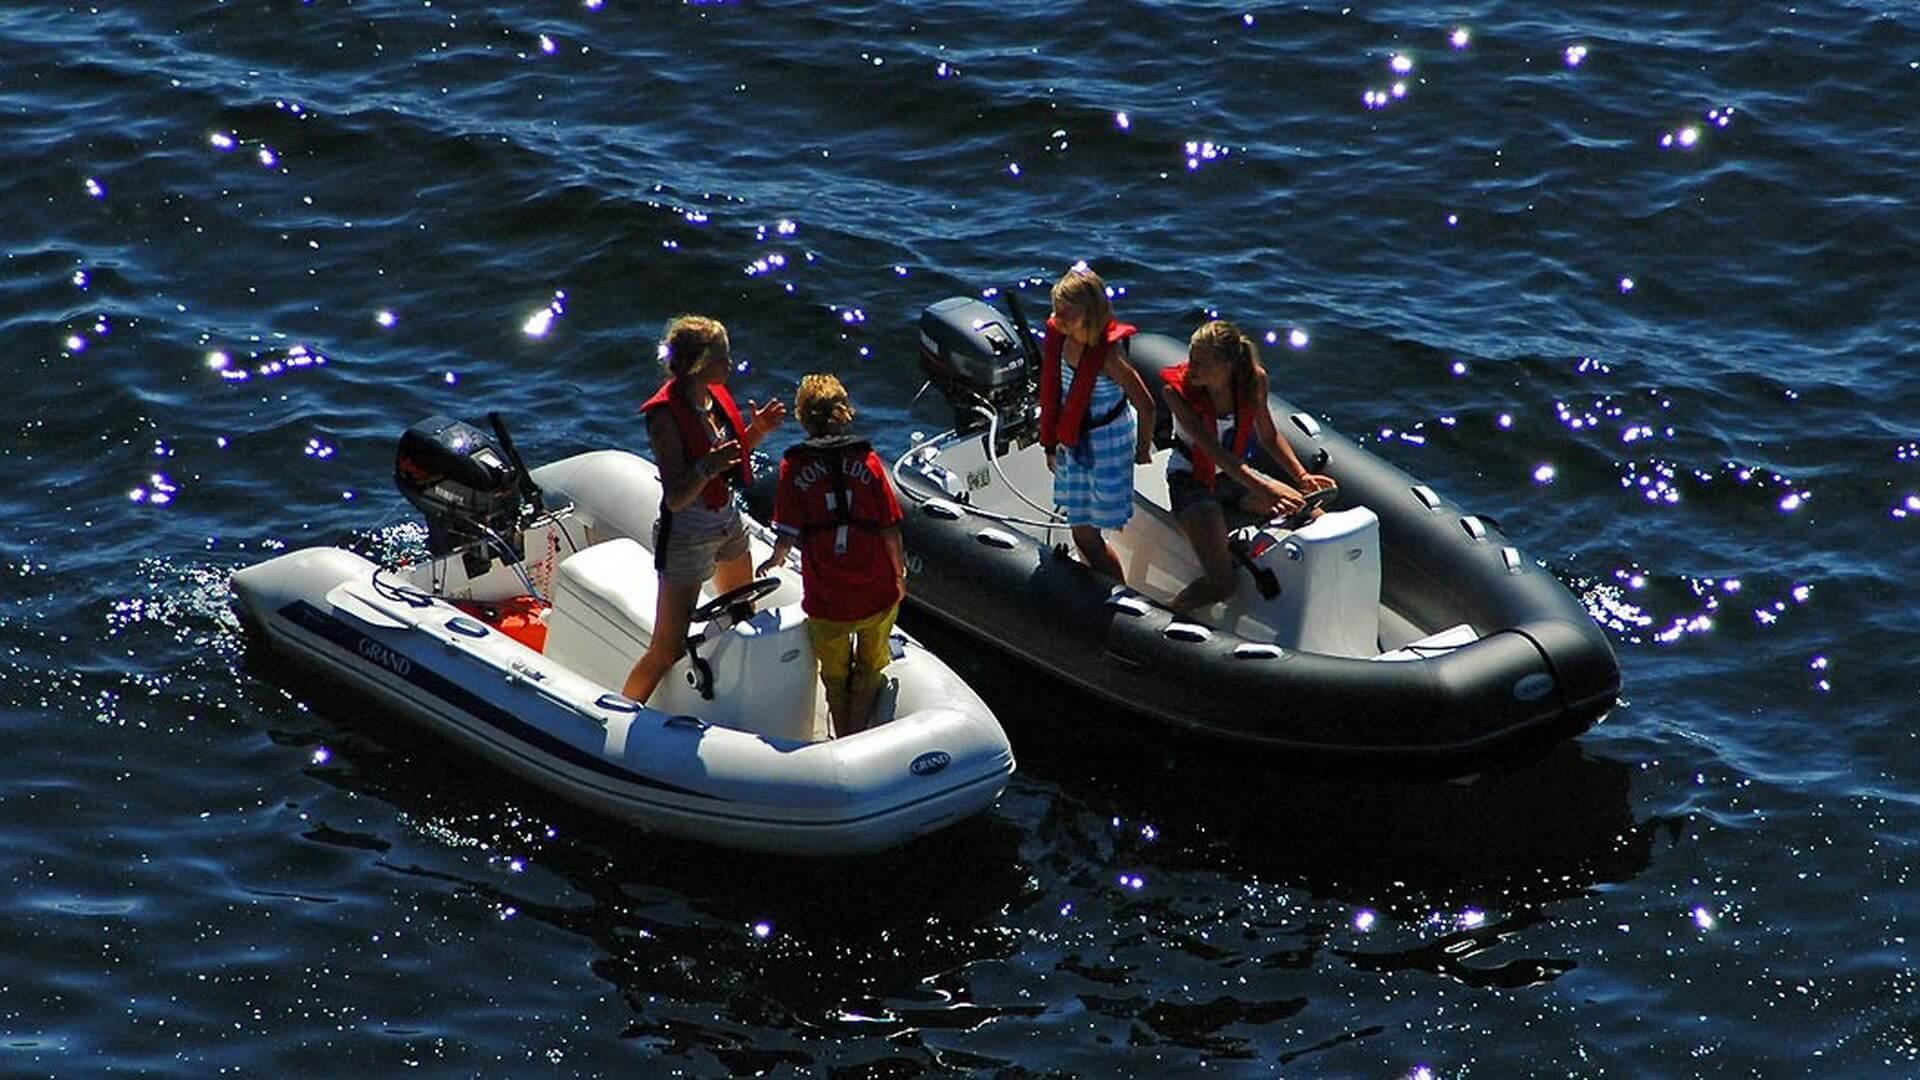 Надувная лодка с жестким дном GRAND Silver Line S330s,Надувная лодка GRAND Silver Line S330S, GRAND Silver Line S330S, GRAND Silver Line S330SF, GRAND S330S, GRAND S330SF, GRAND S330, Надувная лодка GRAND, Надувная лодка ГРАНД, Надувная лодка с жестким дном, RIB, Rigid Inflatable Boats